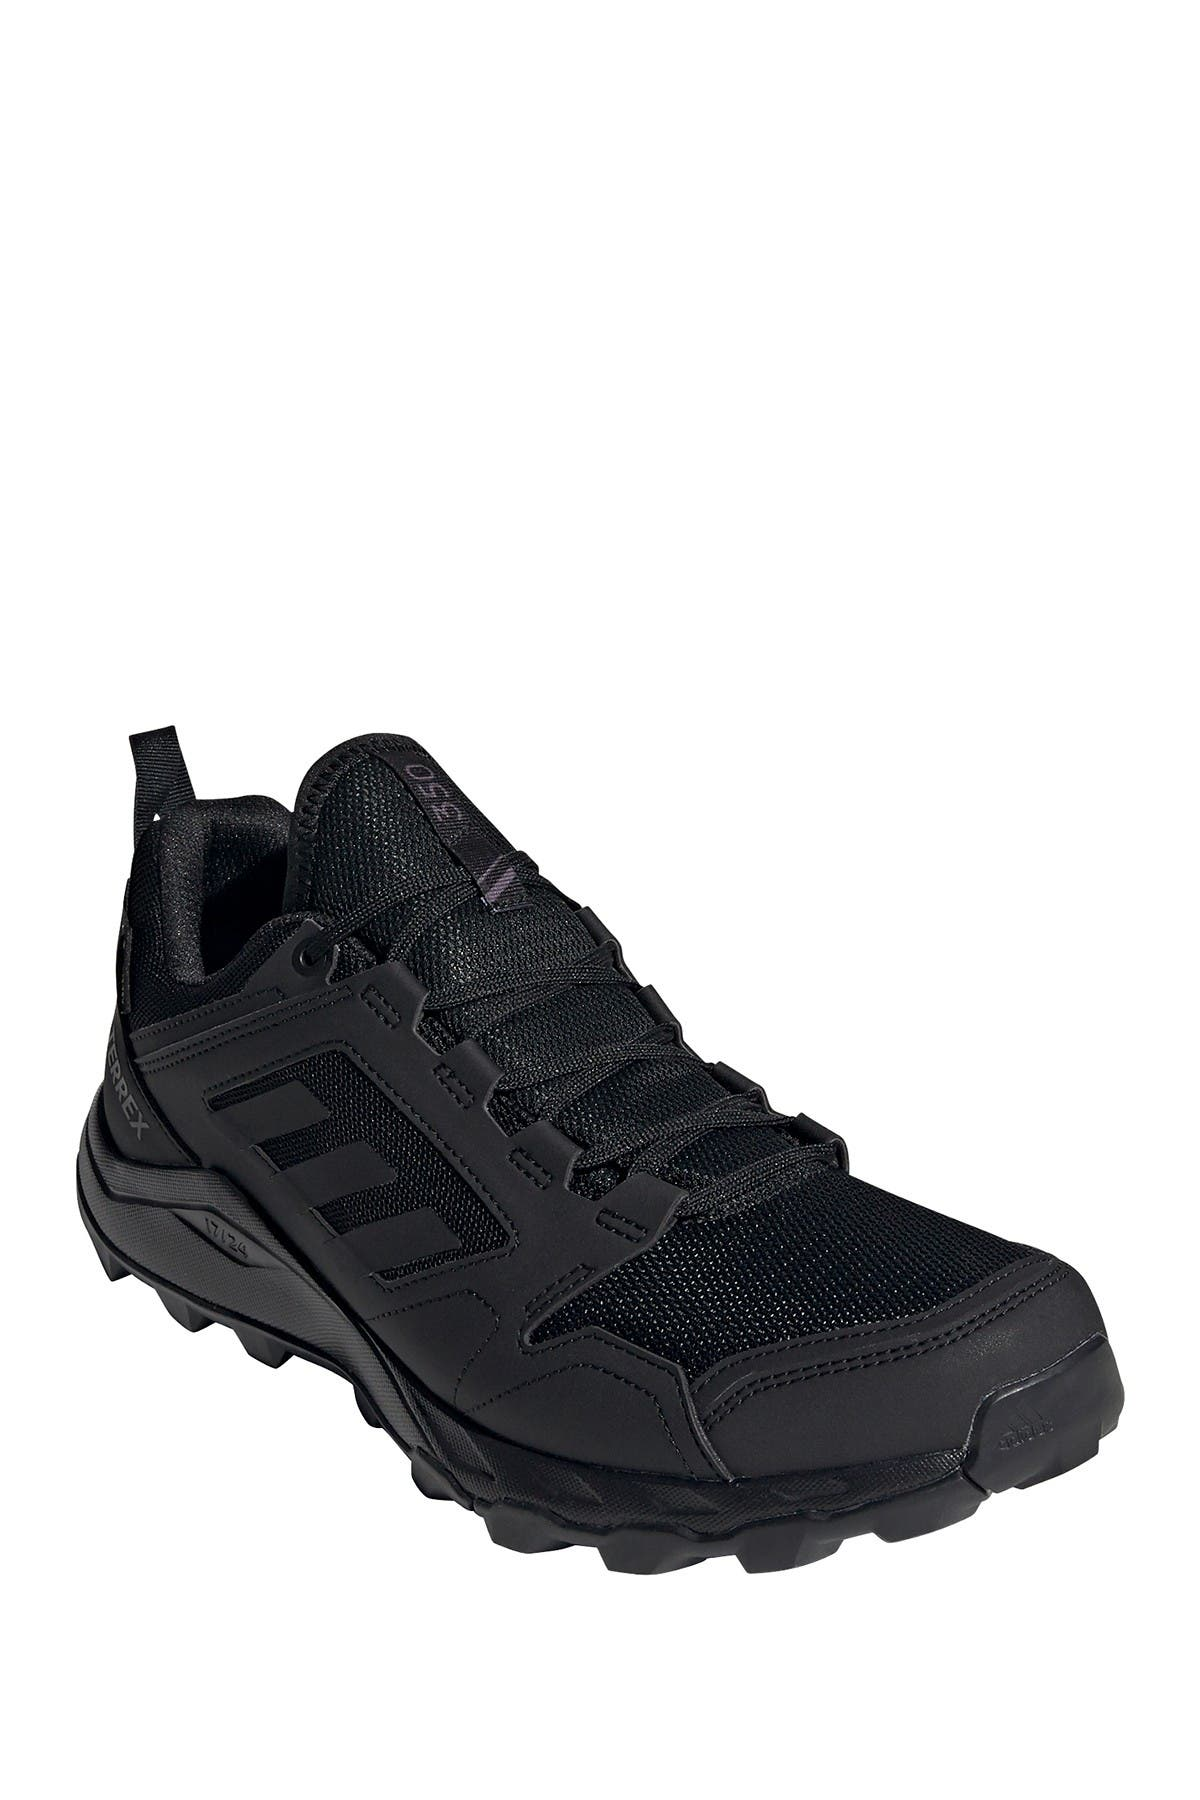 Image of adidas Terrex Agravic XT Trail Sneaker